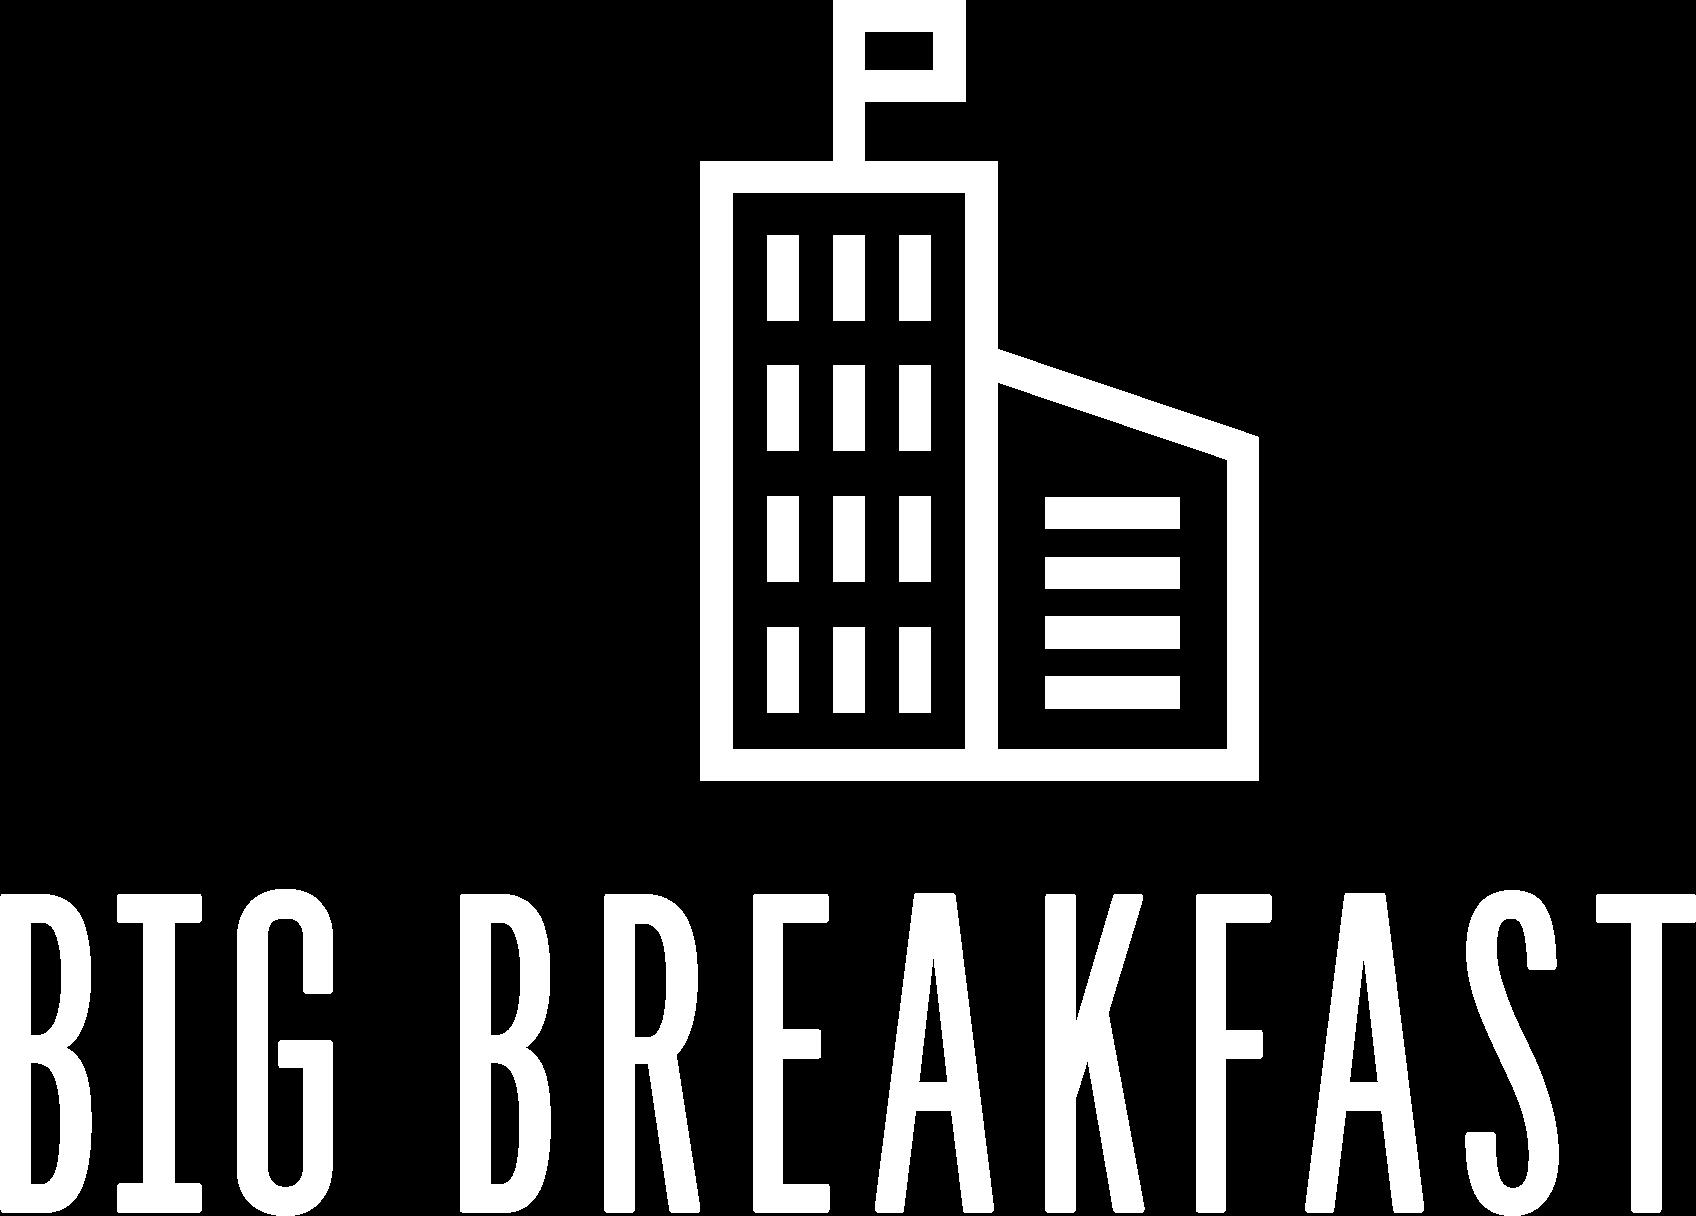 . Pancake clipart big breakfast